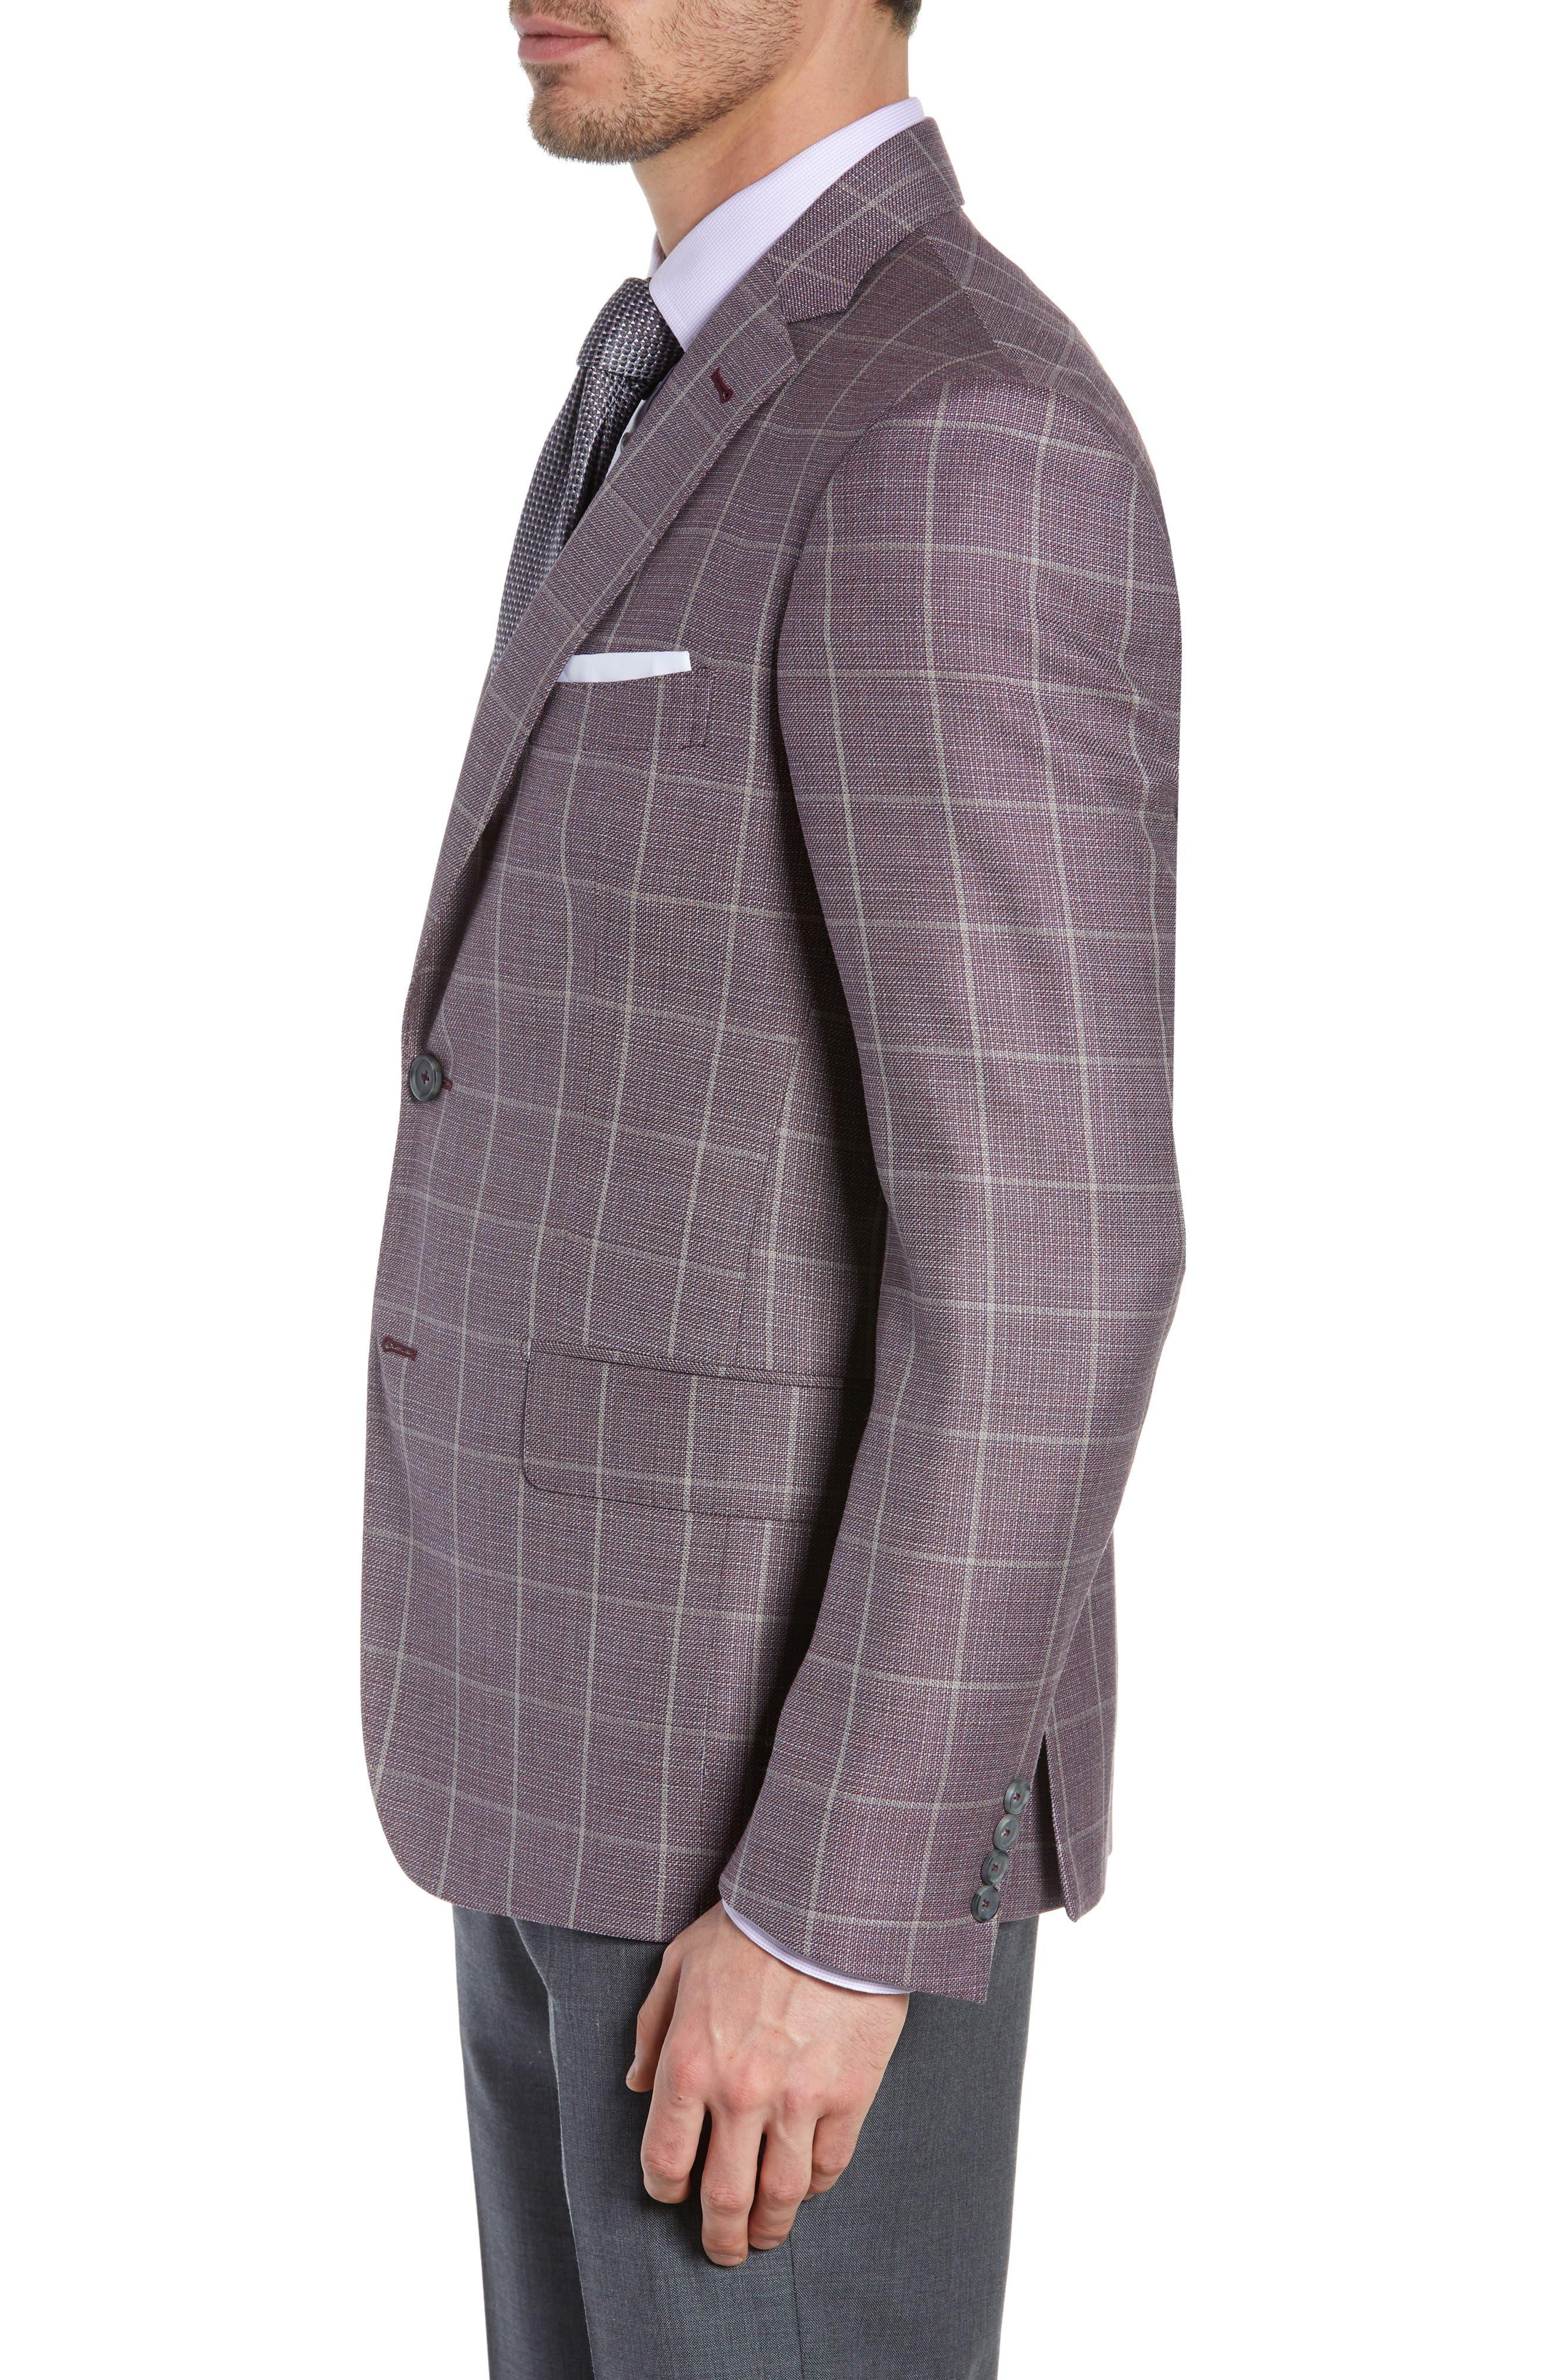 JOHN W. NORDSTROM<SUP>®</SUP>, Traditional Fit Windowpane Wool Sport Coat, Alternate thumbnail 3, color, BURGUNDY SASS WINDOWPANE